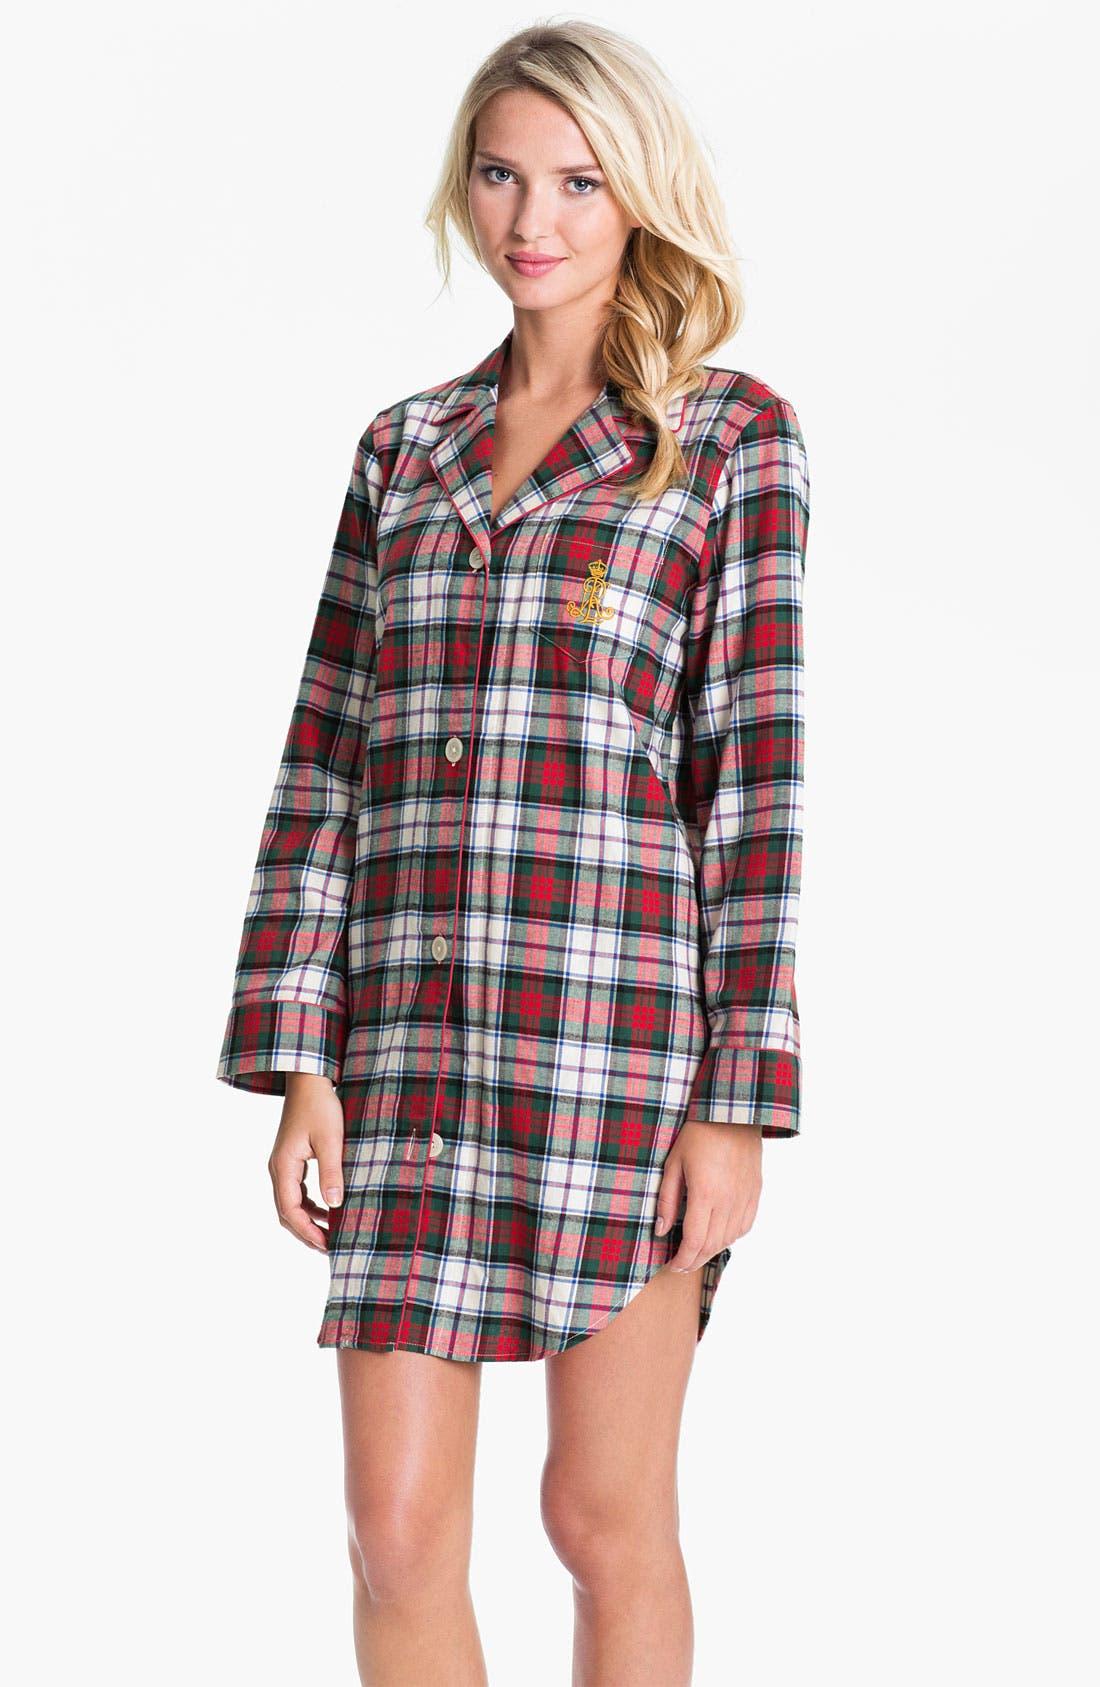 Main Image - Lauren Ralph Lauren Sleepwear Brushed Twill Nightshirt